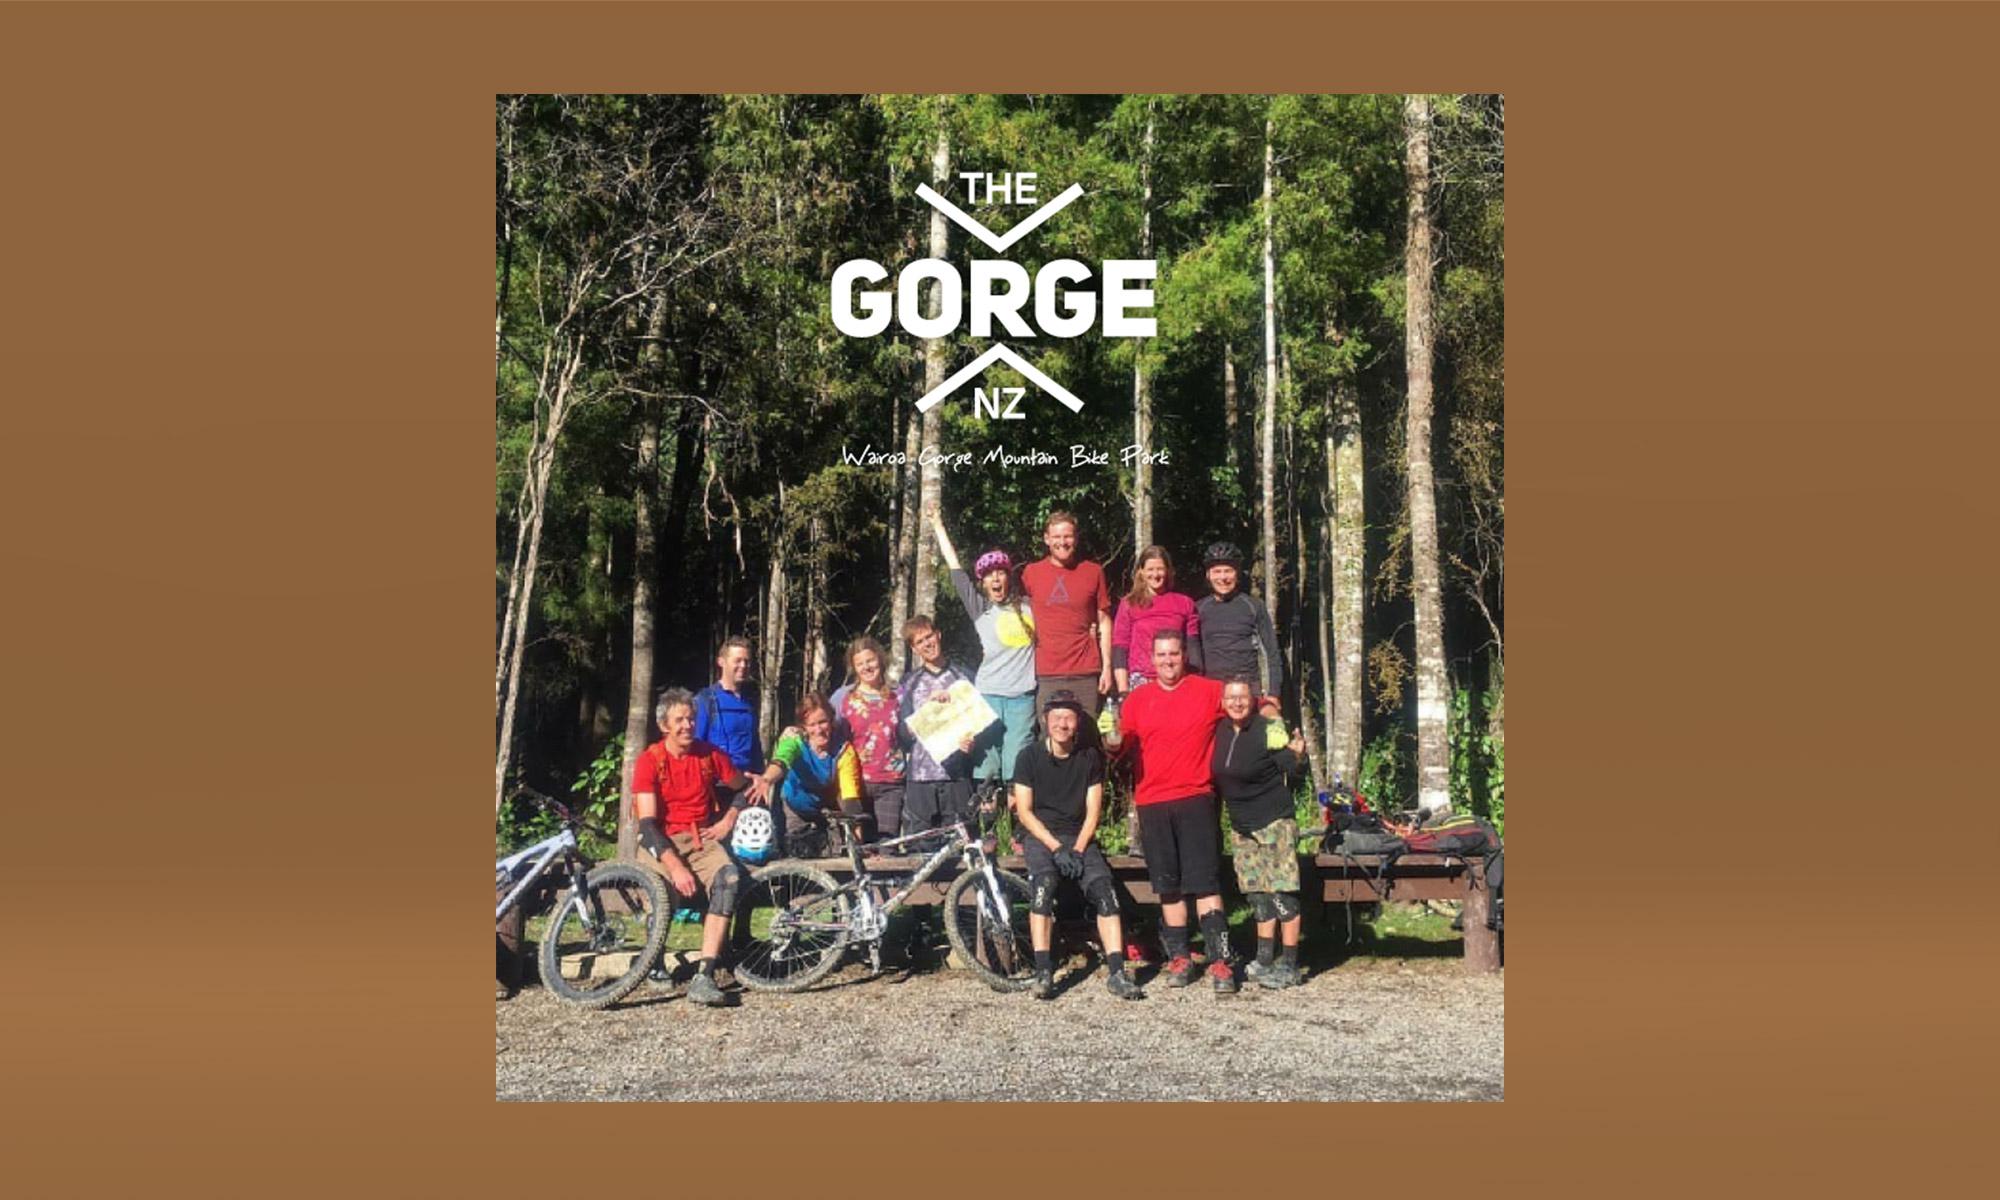 The-Gorge-1.jpg